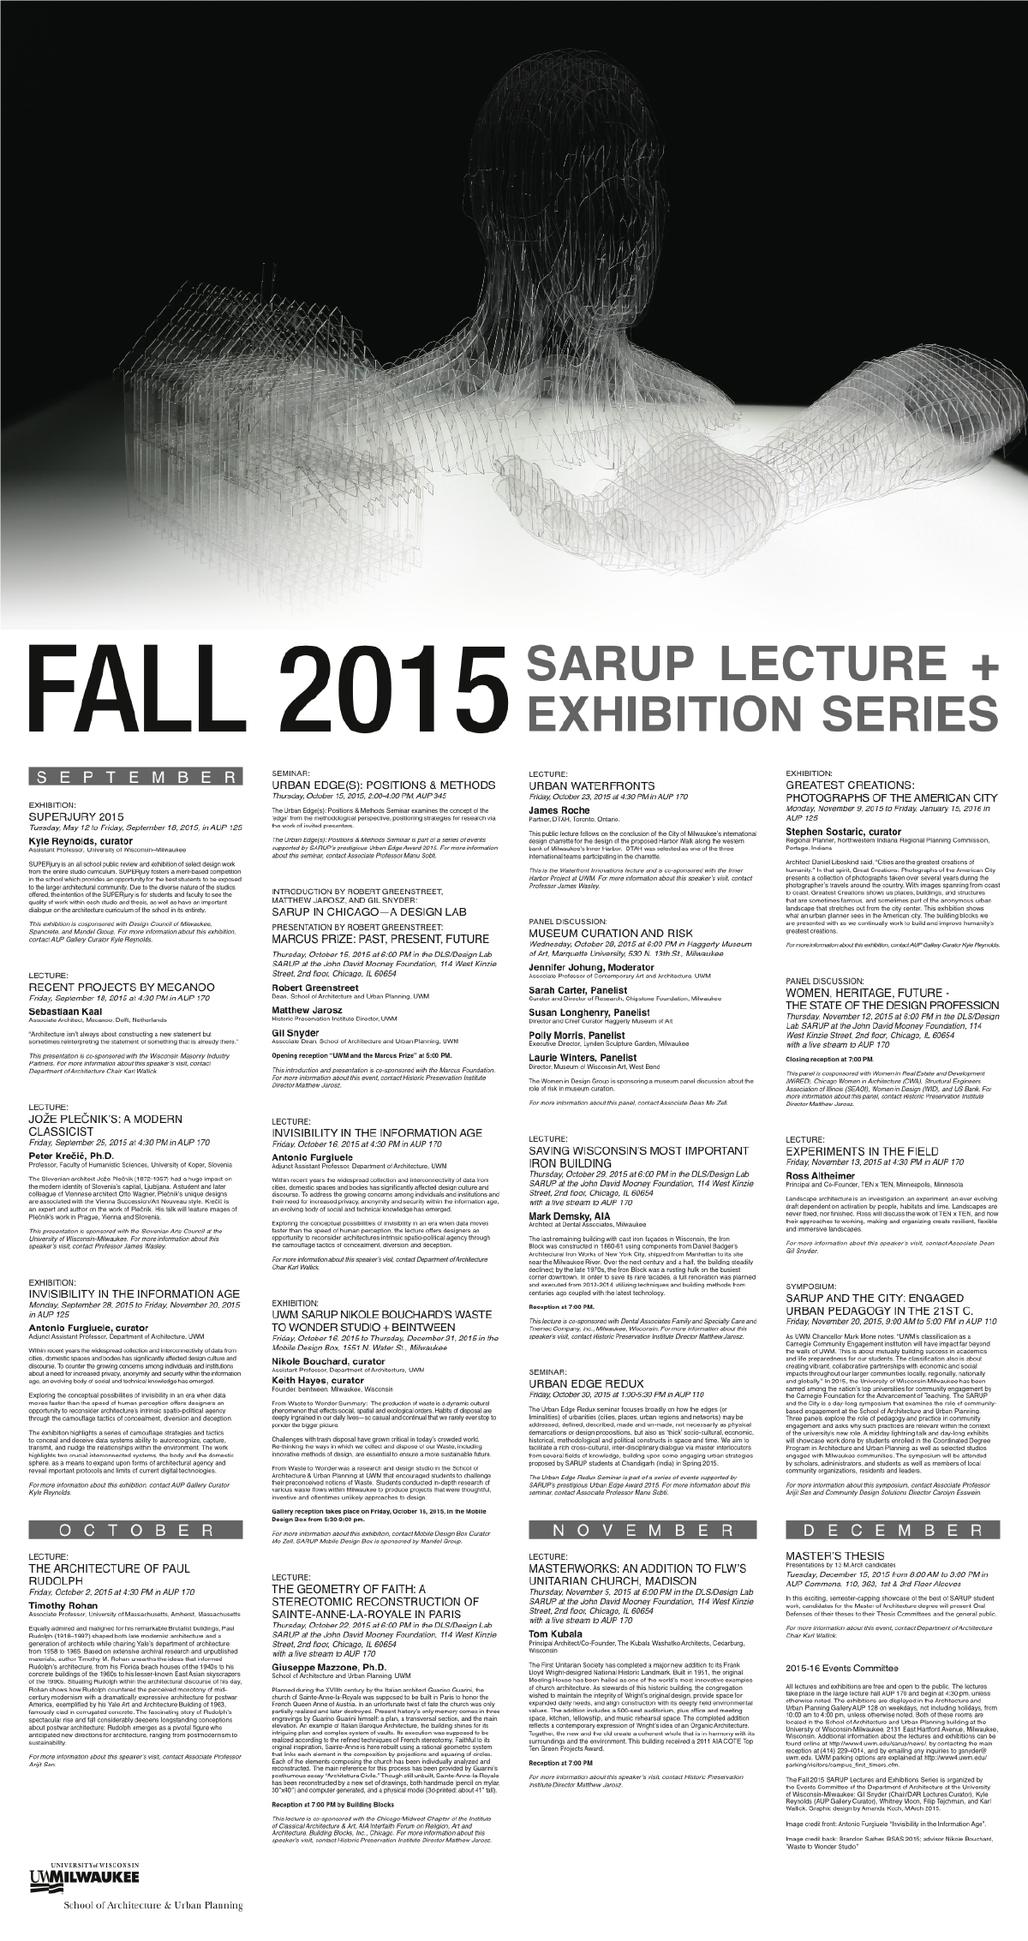 Courtesy of University of Wisconsin Milwaukee SARUP.